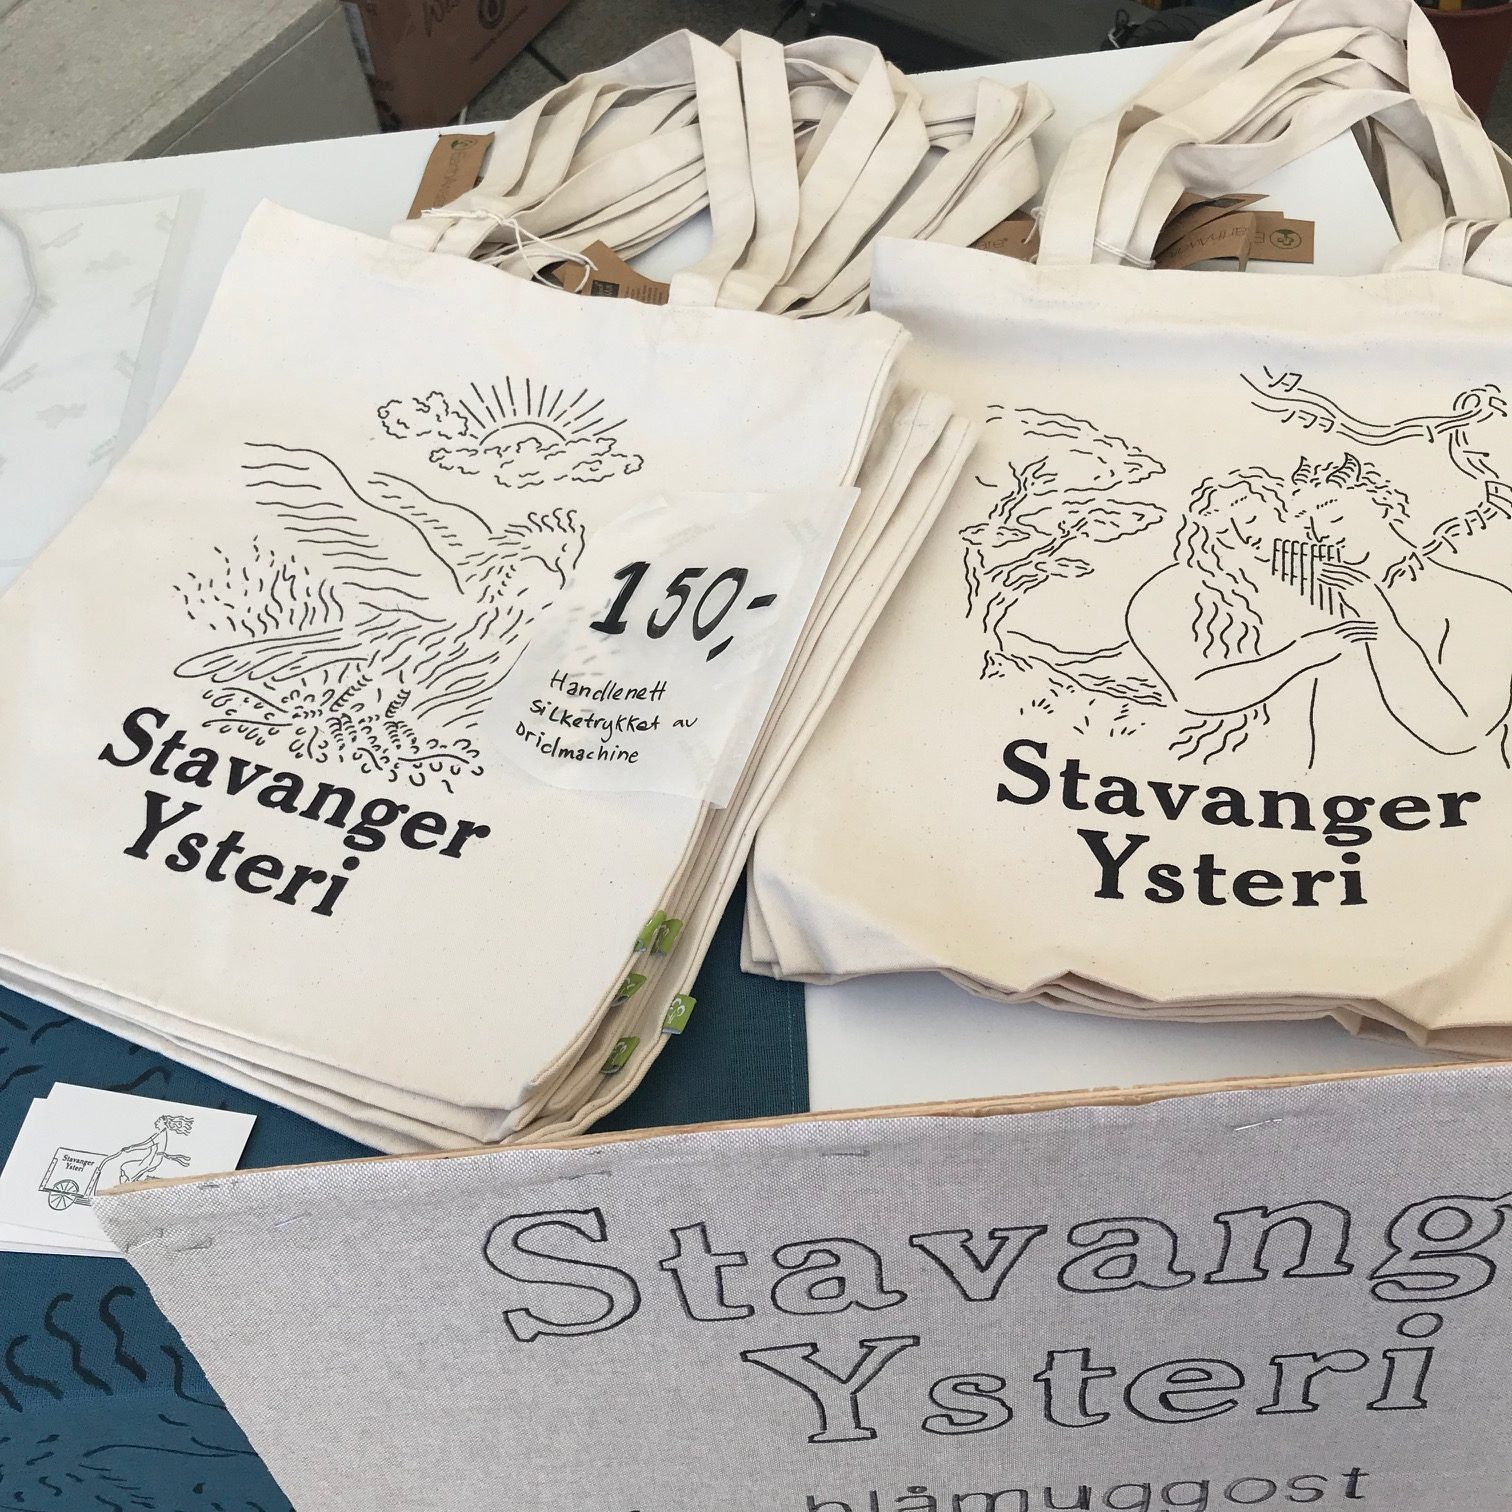 Read more about the article Stavanger Ysteri vinner Matkulturpris